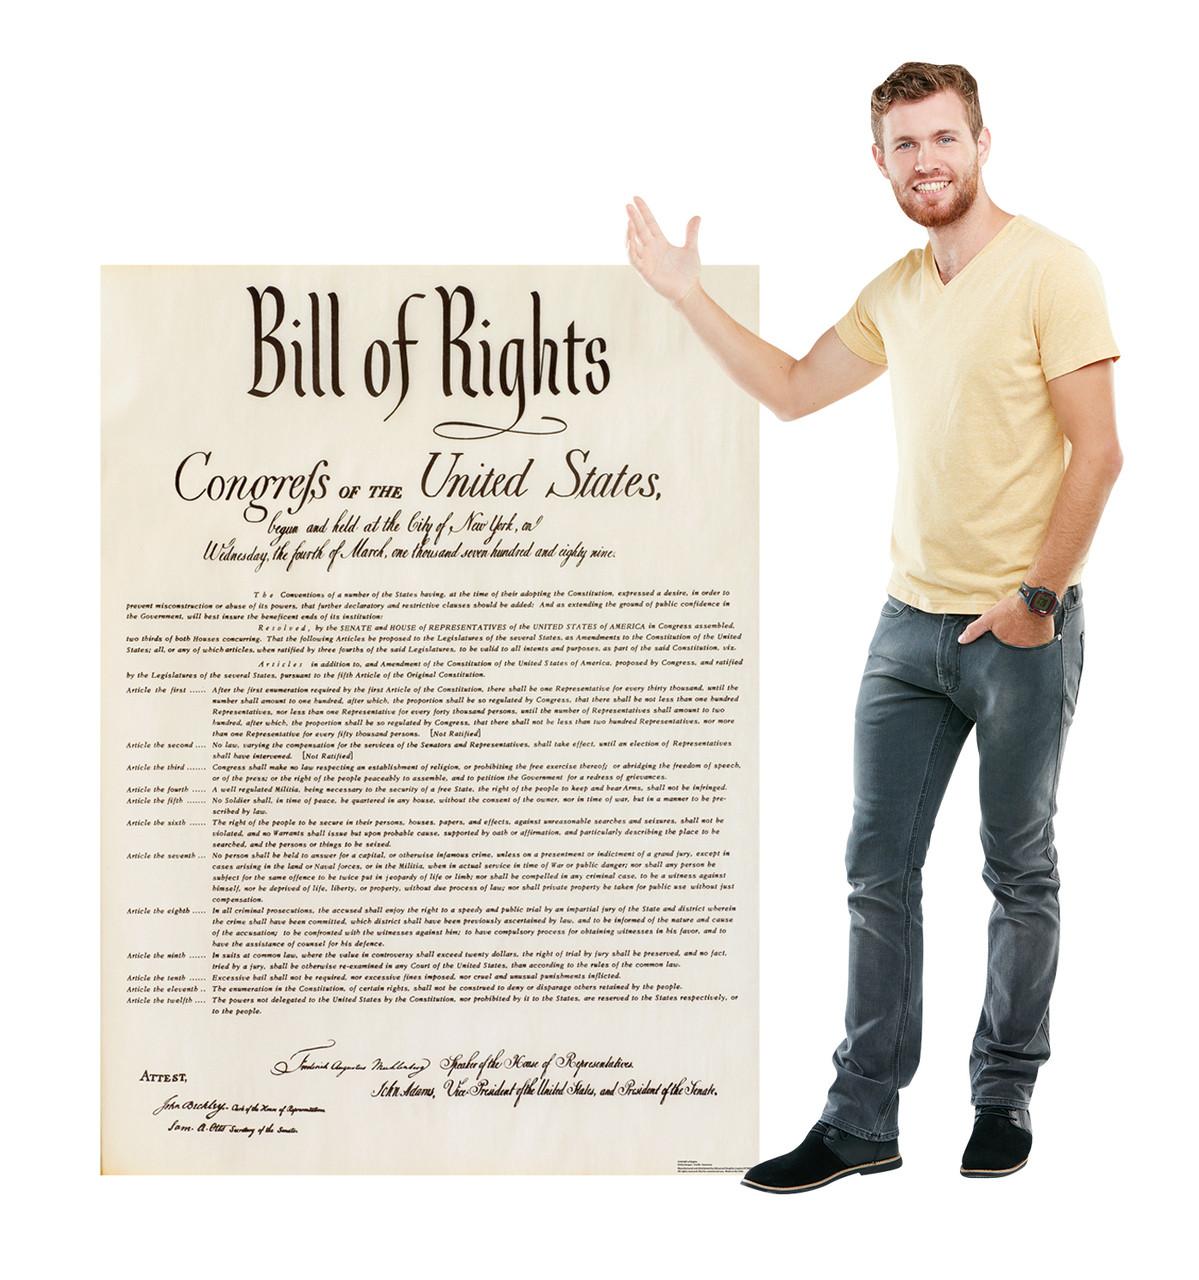 Life-size Bill of Rights Cardboard Cutout Cardboard Standup 3